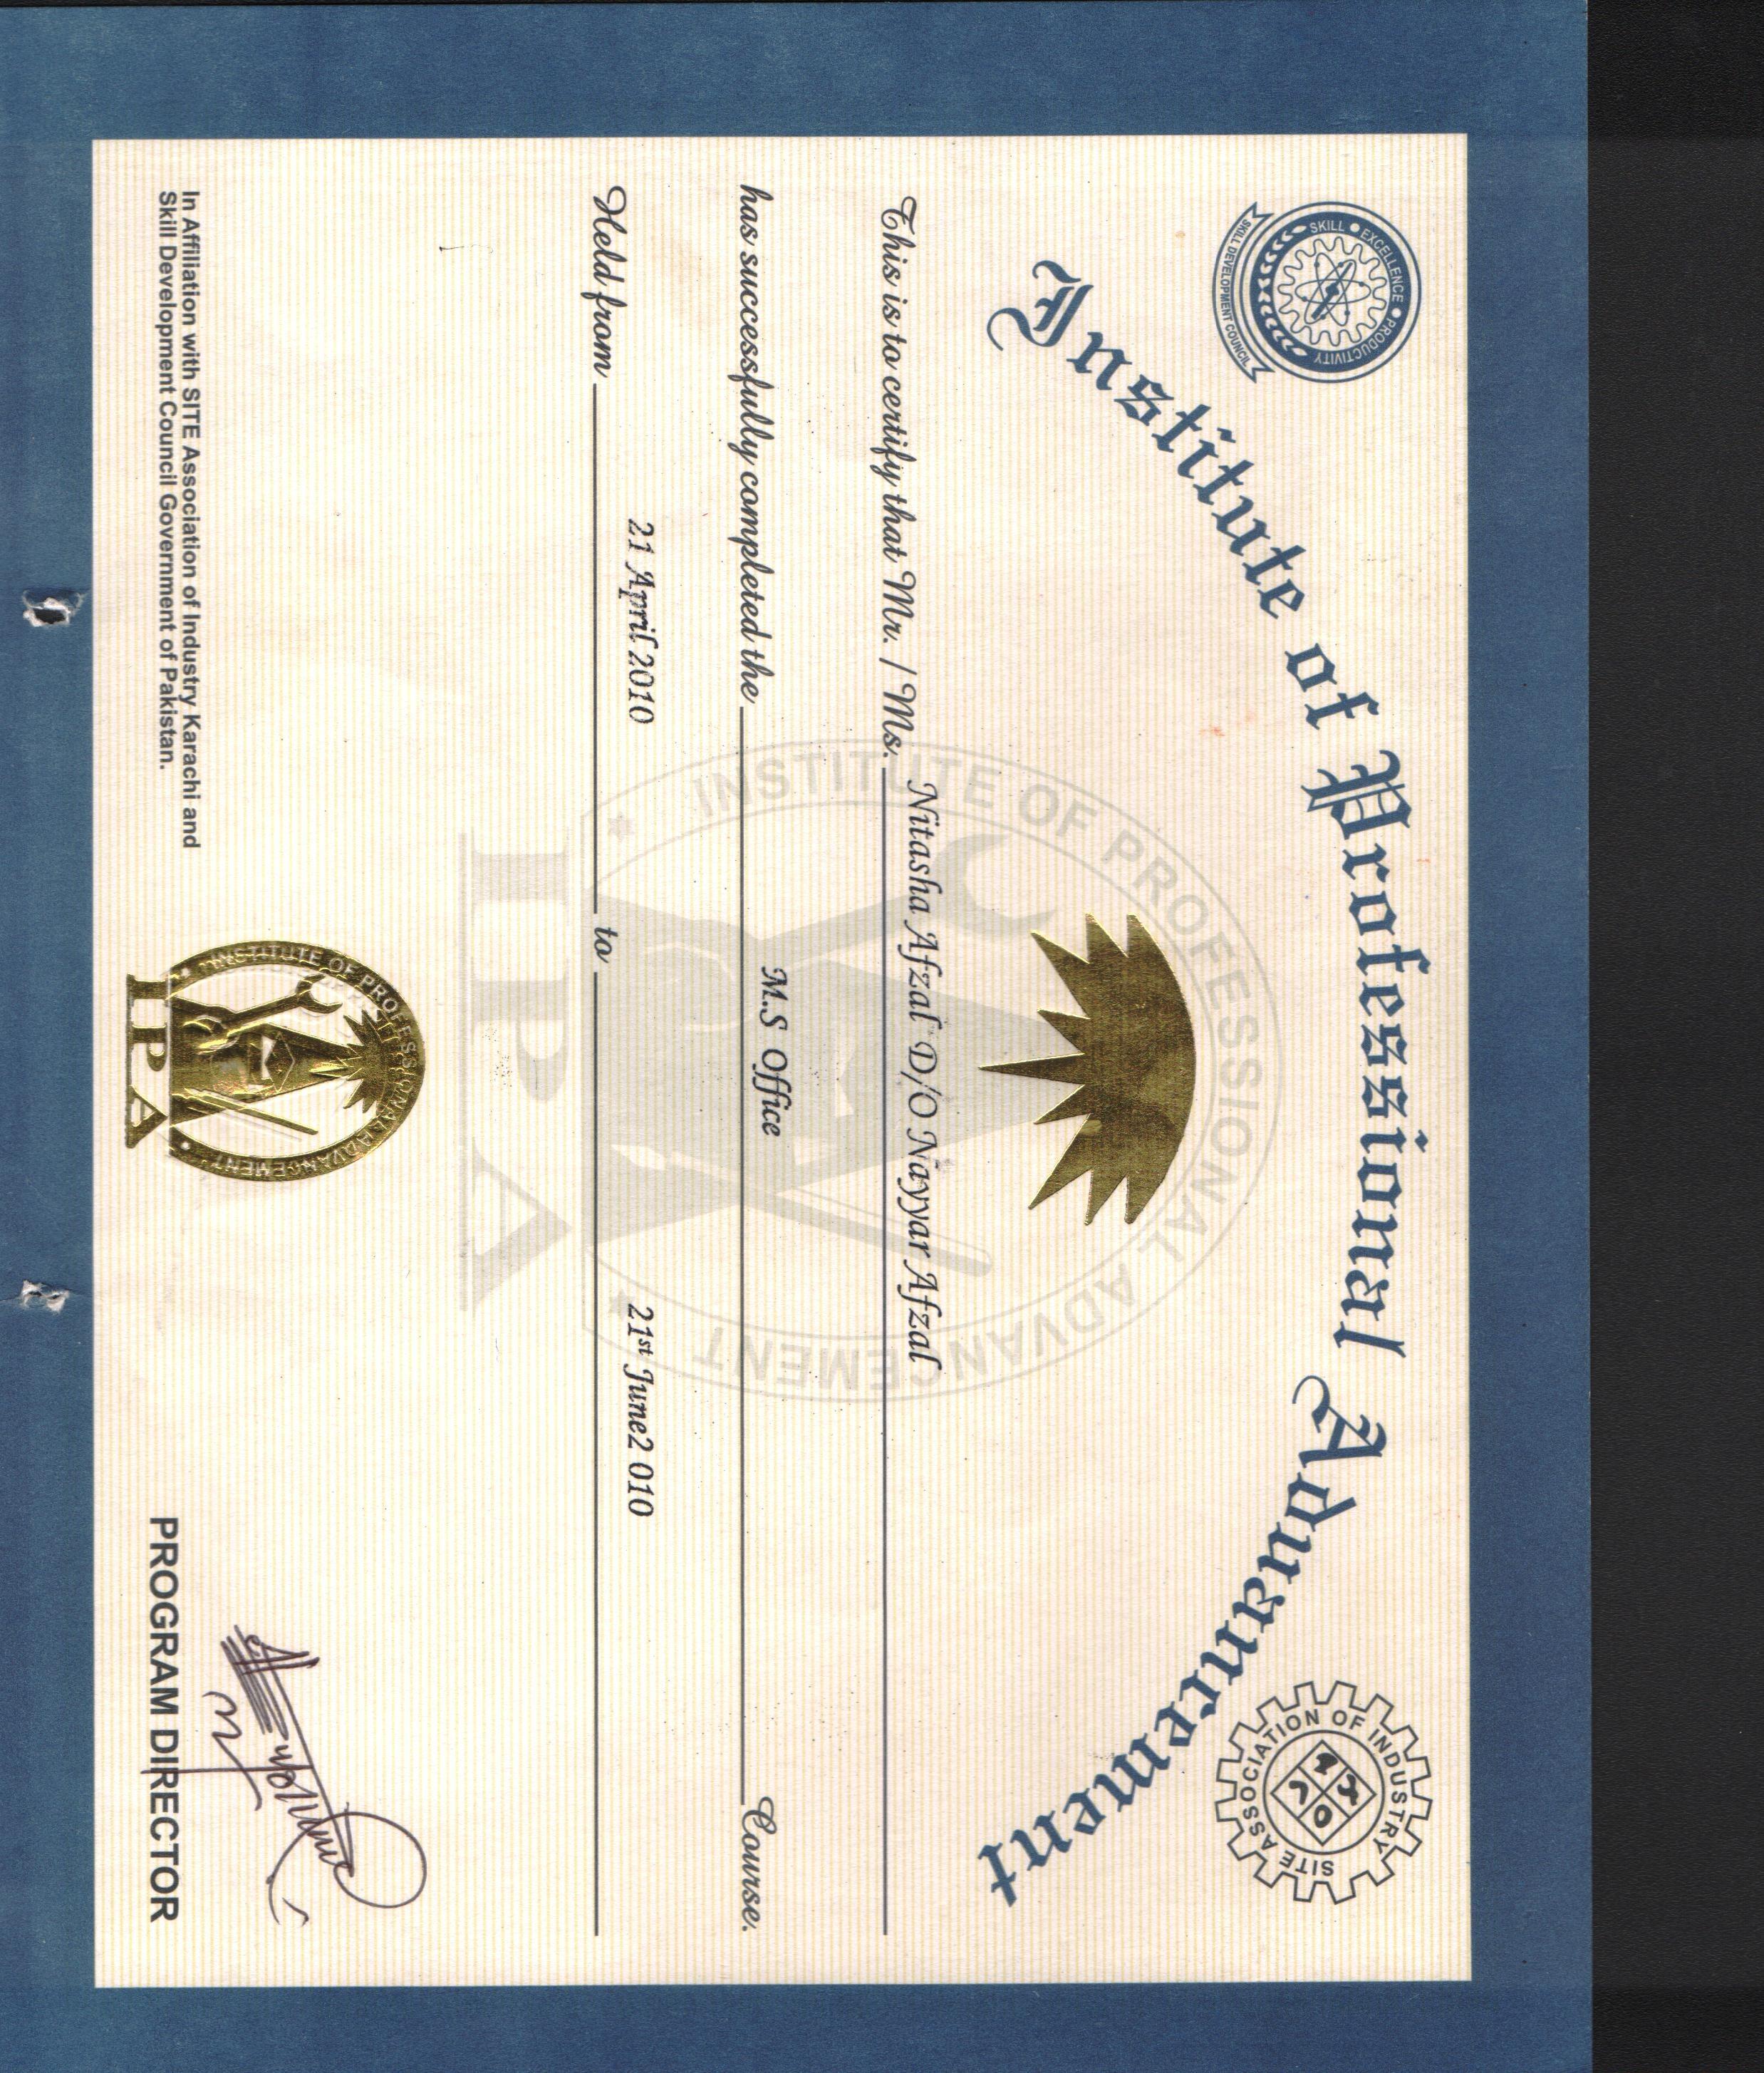 Ms Office Certifications Terimarieharrison Best Resume